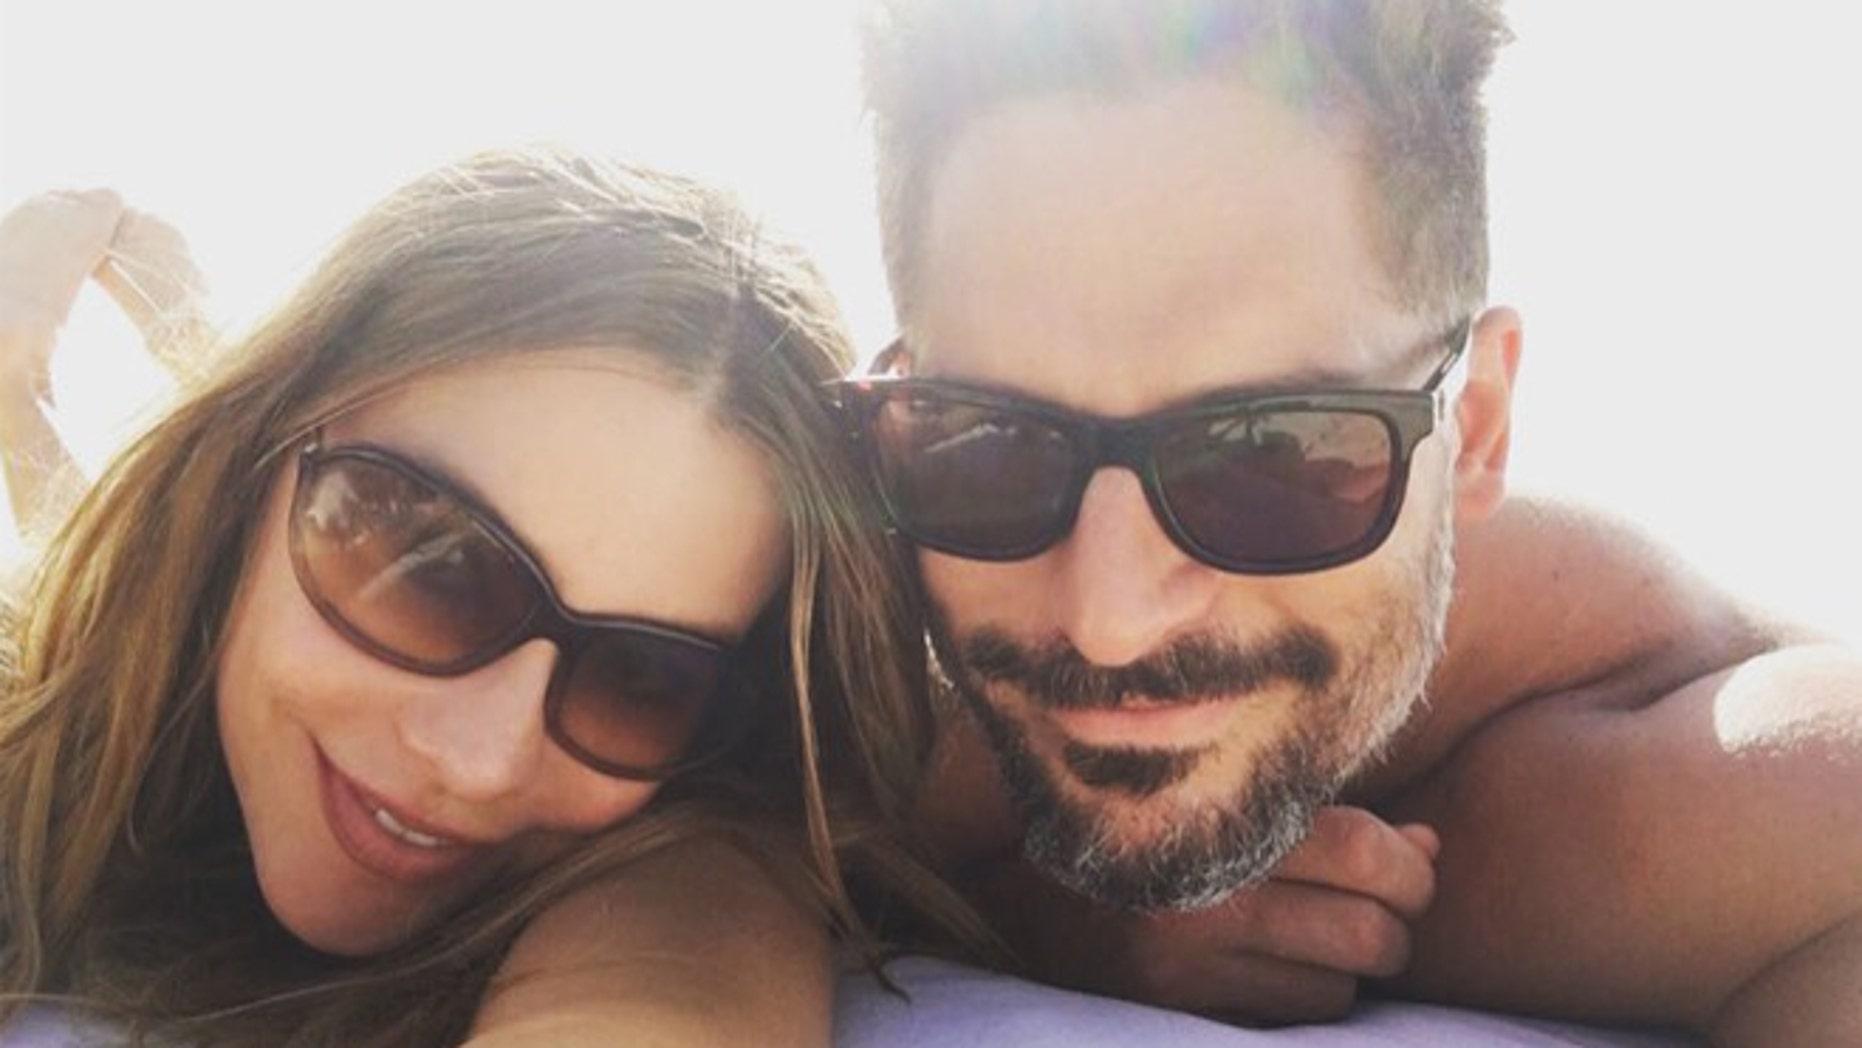 Sofia Vergara and Joe Manganiello on the beach in Turks and Caicos. (Photo: via Instagram)